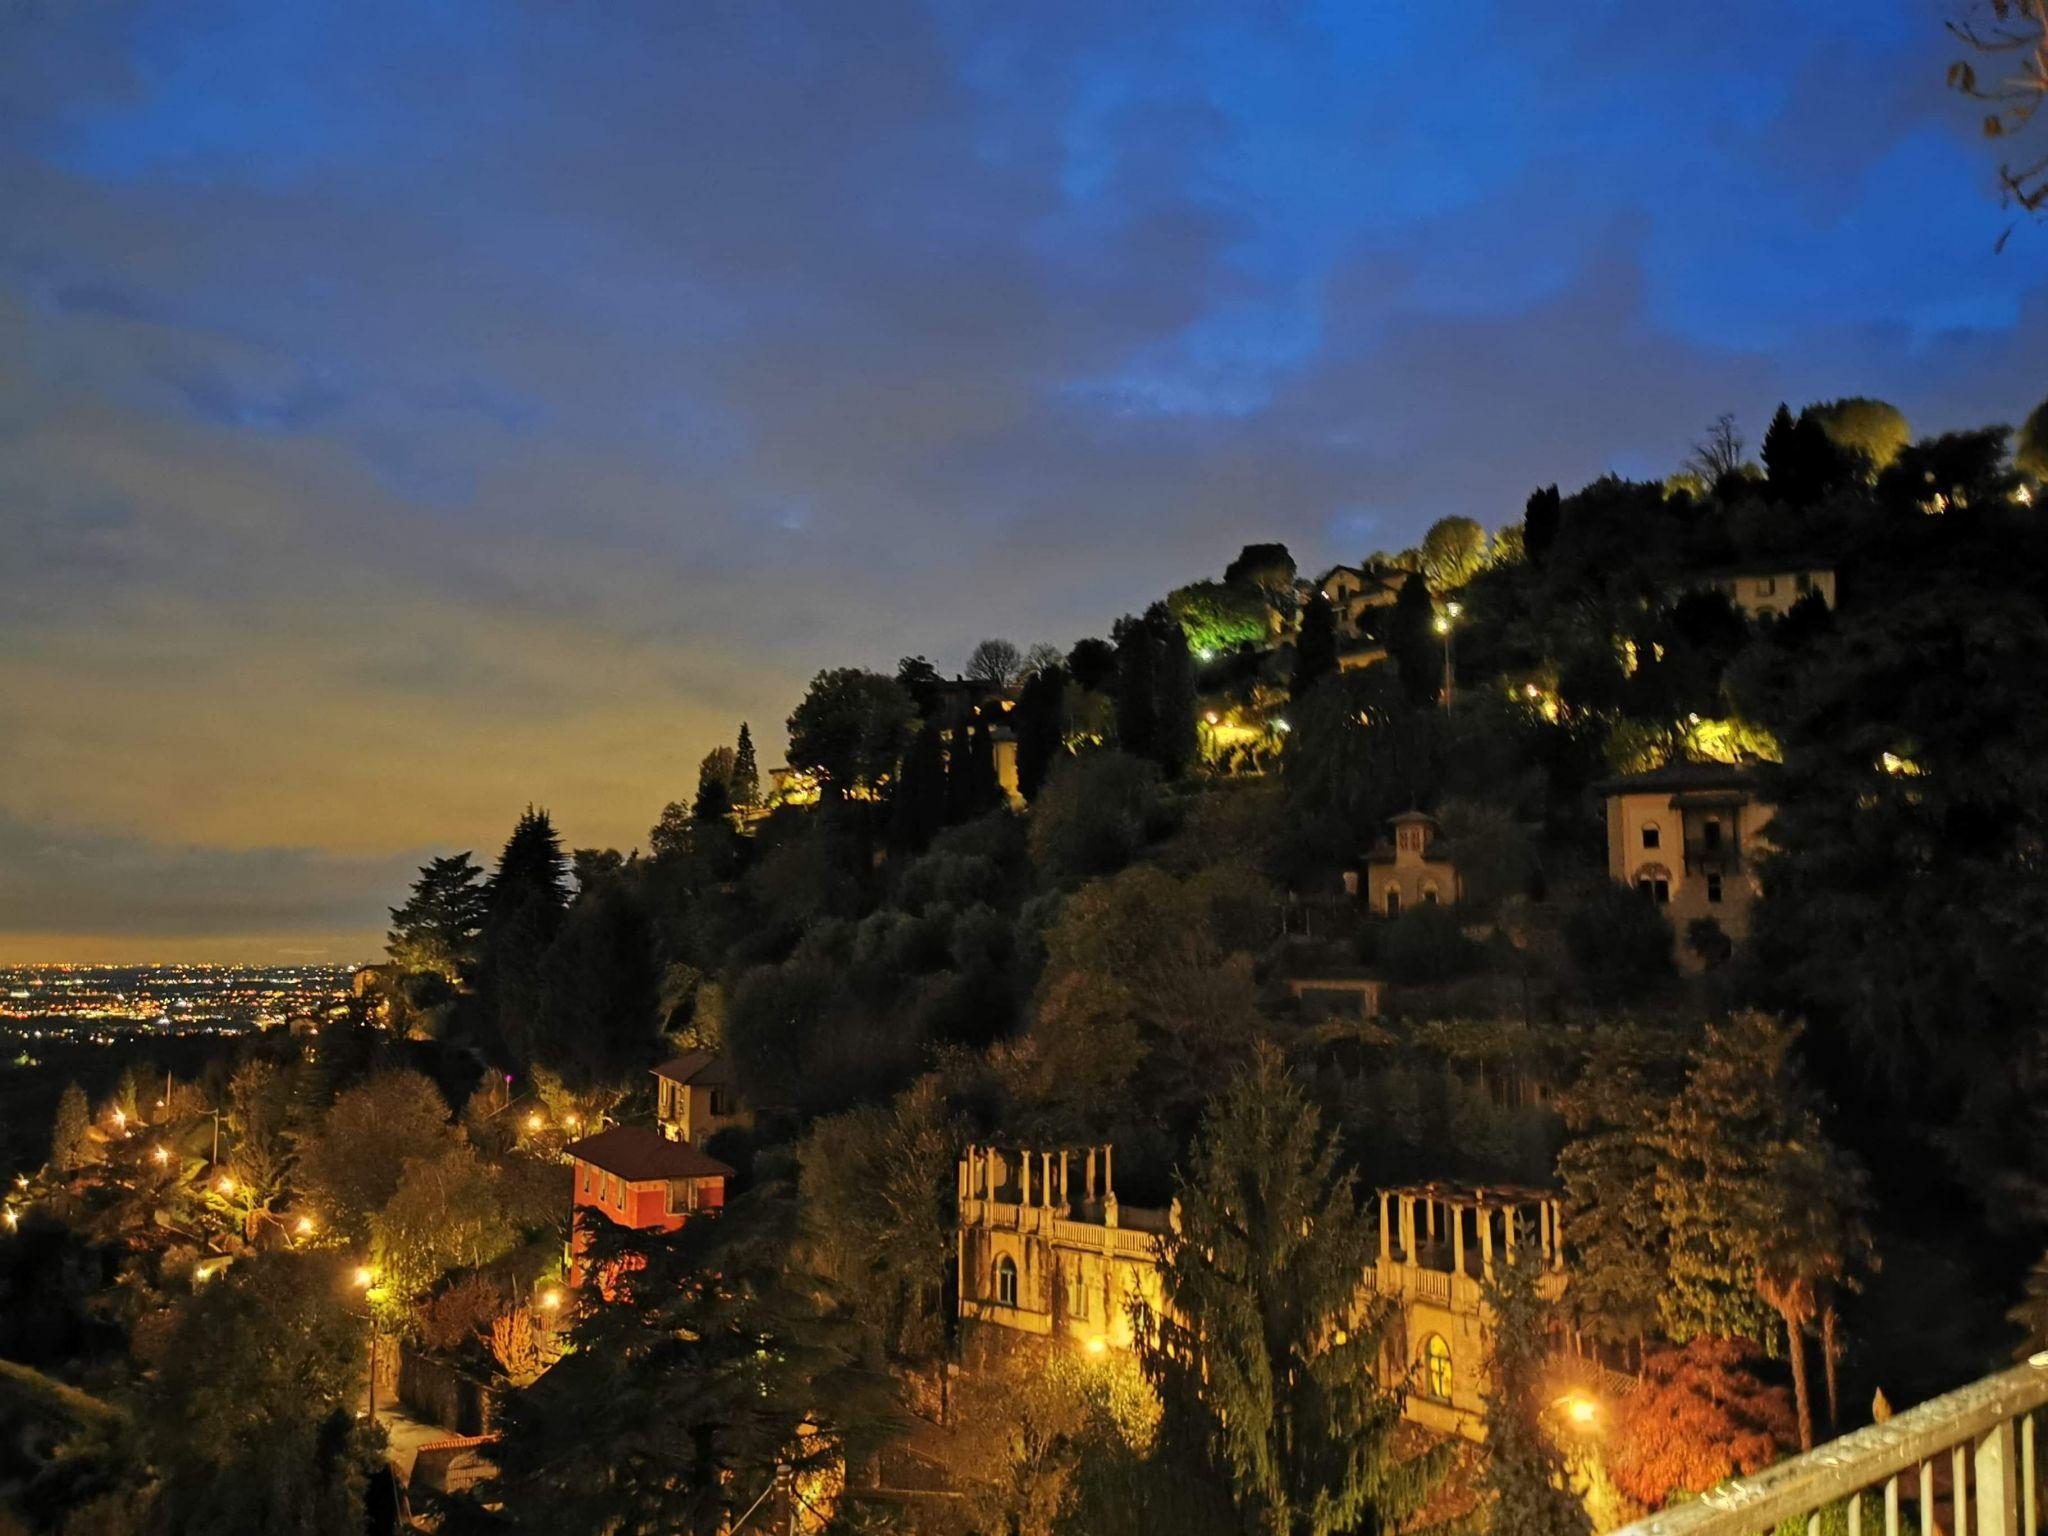 San Vigilio, Italy